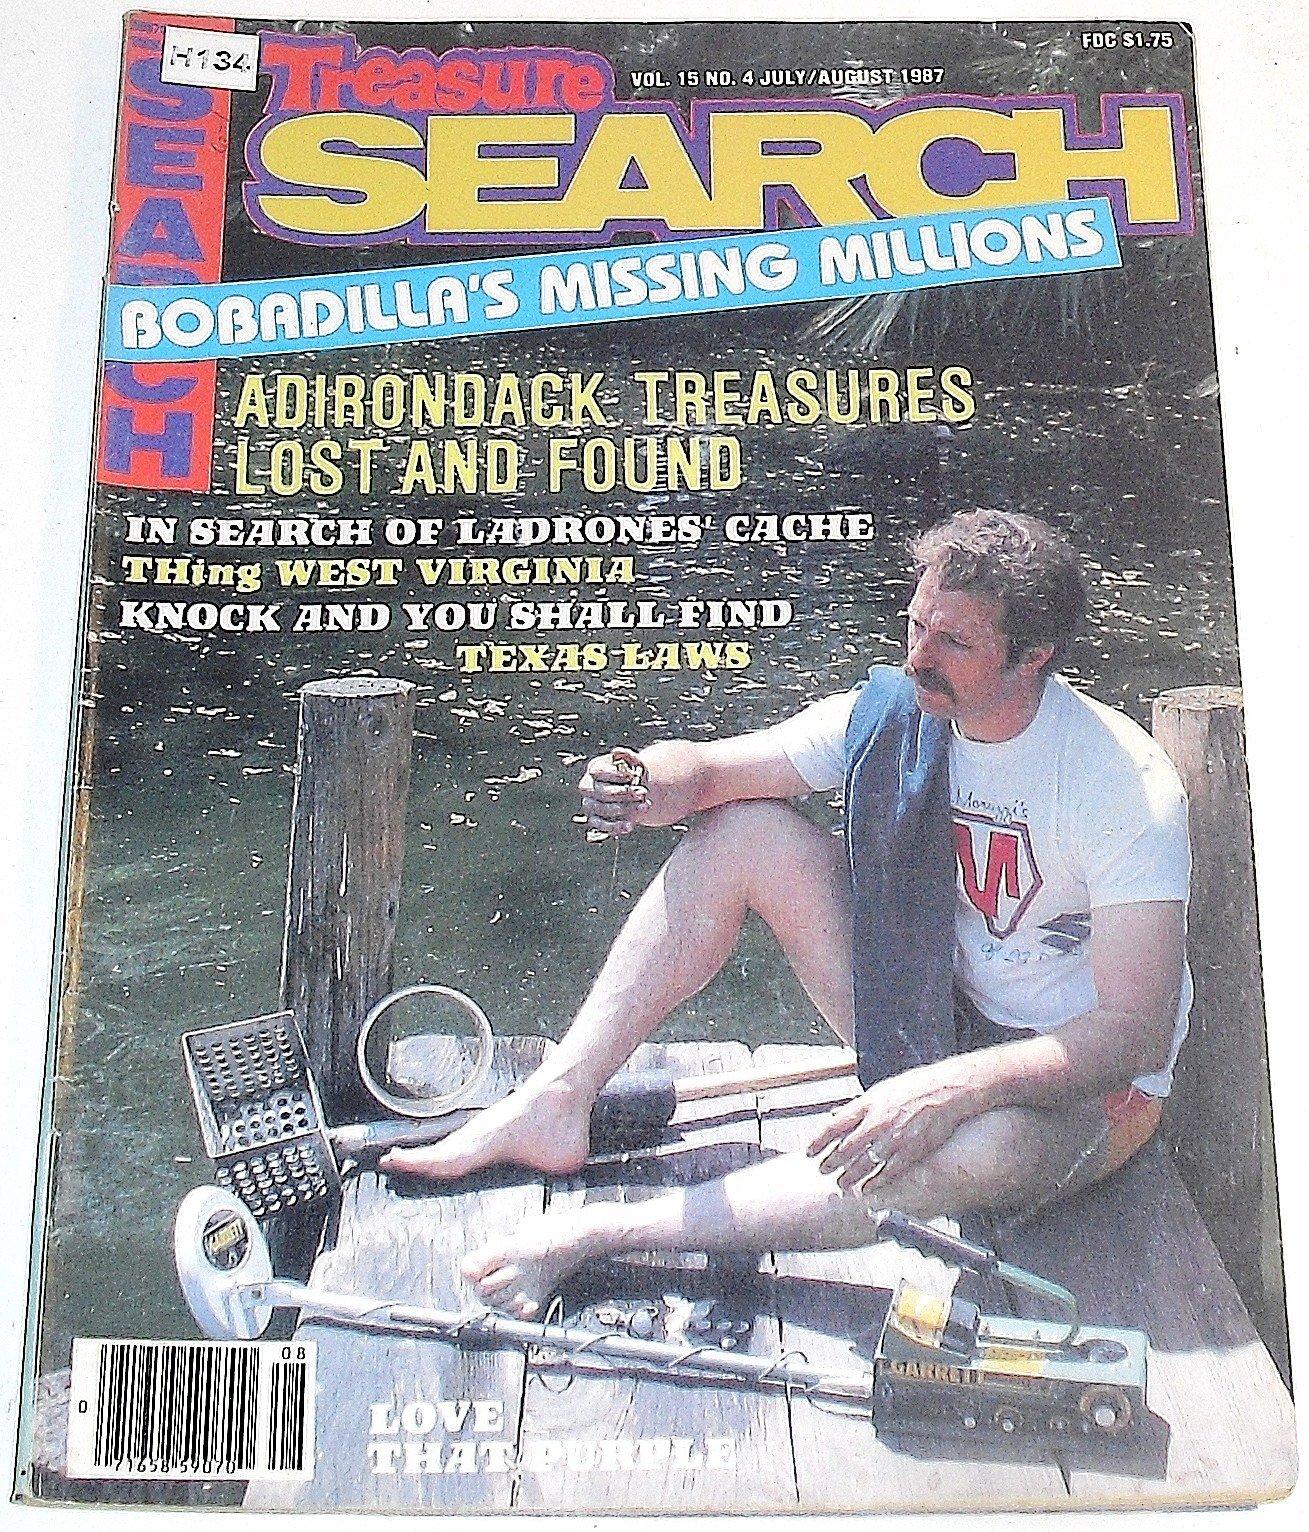 Treasure Search Magazine, July/August 1987 (Volume 15, No. 4) Single Issue Magazine – 1987